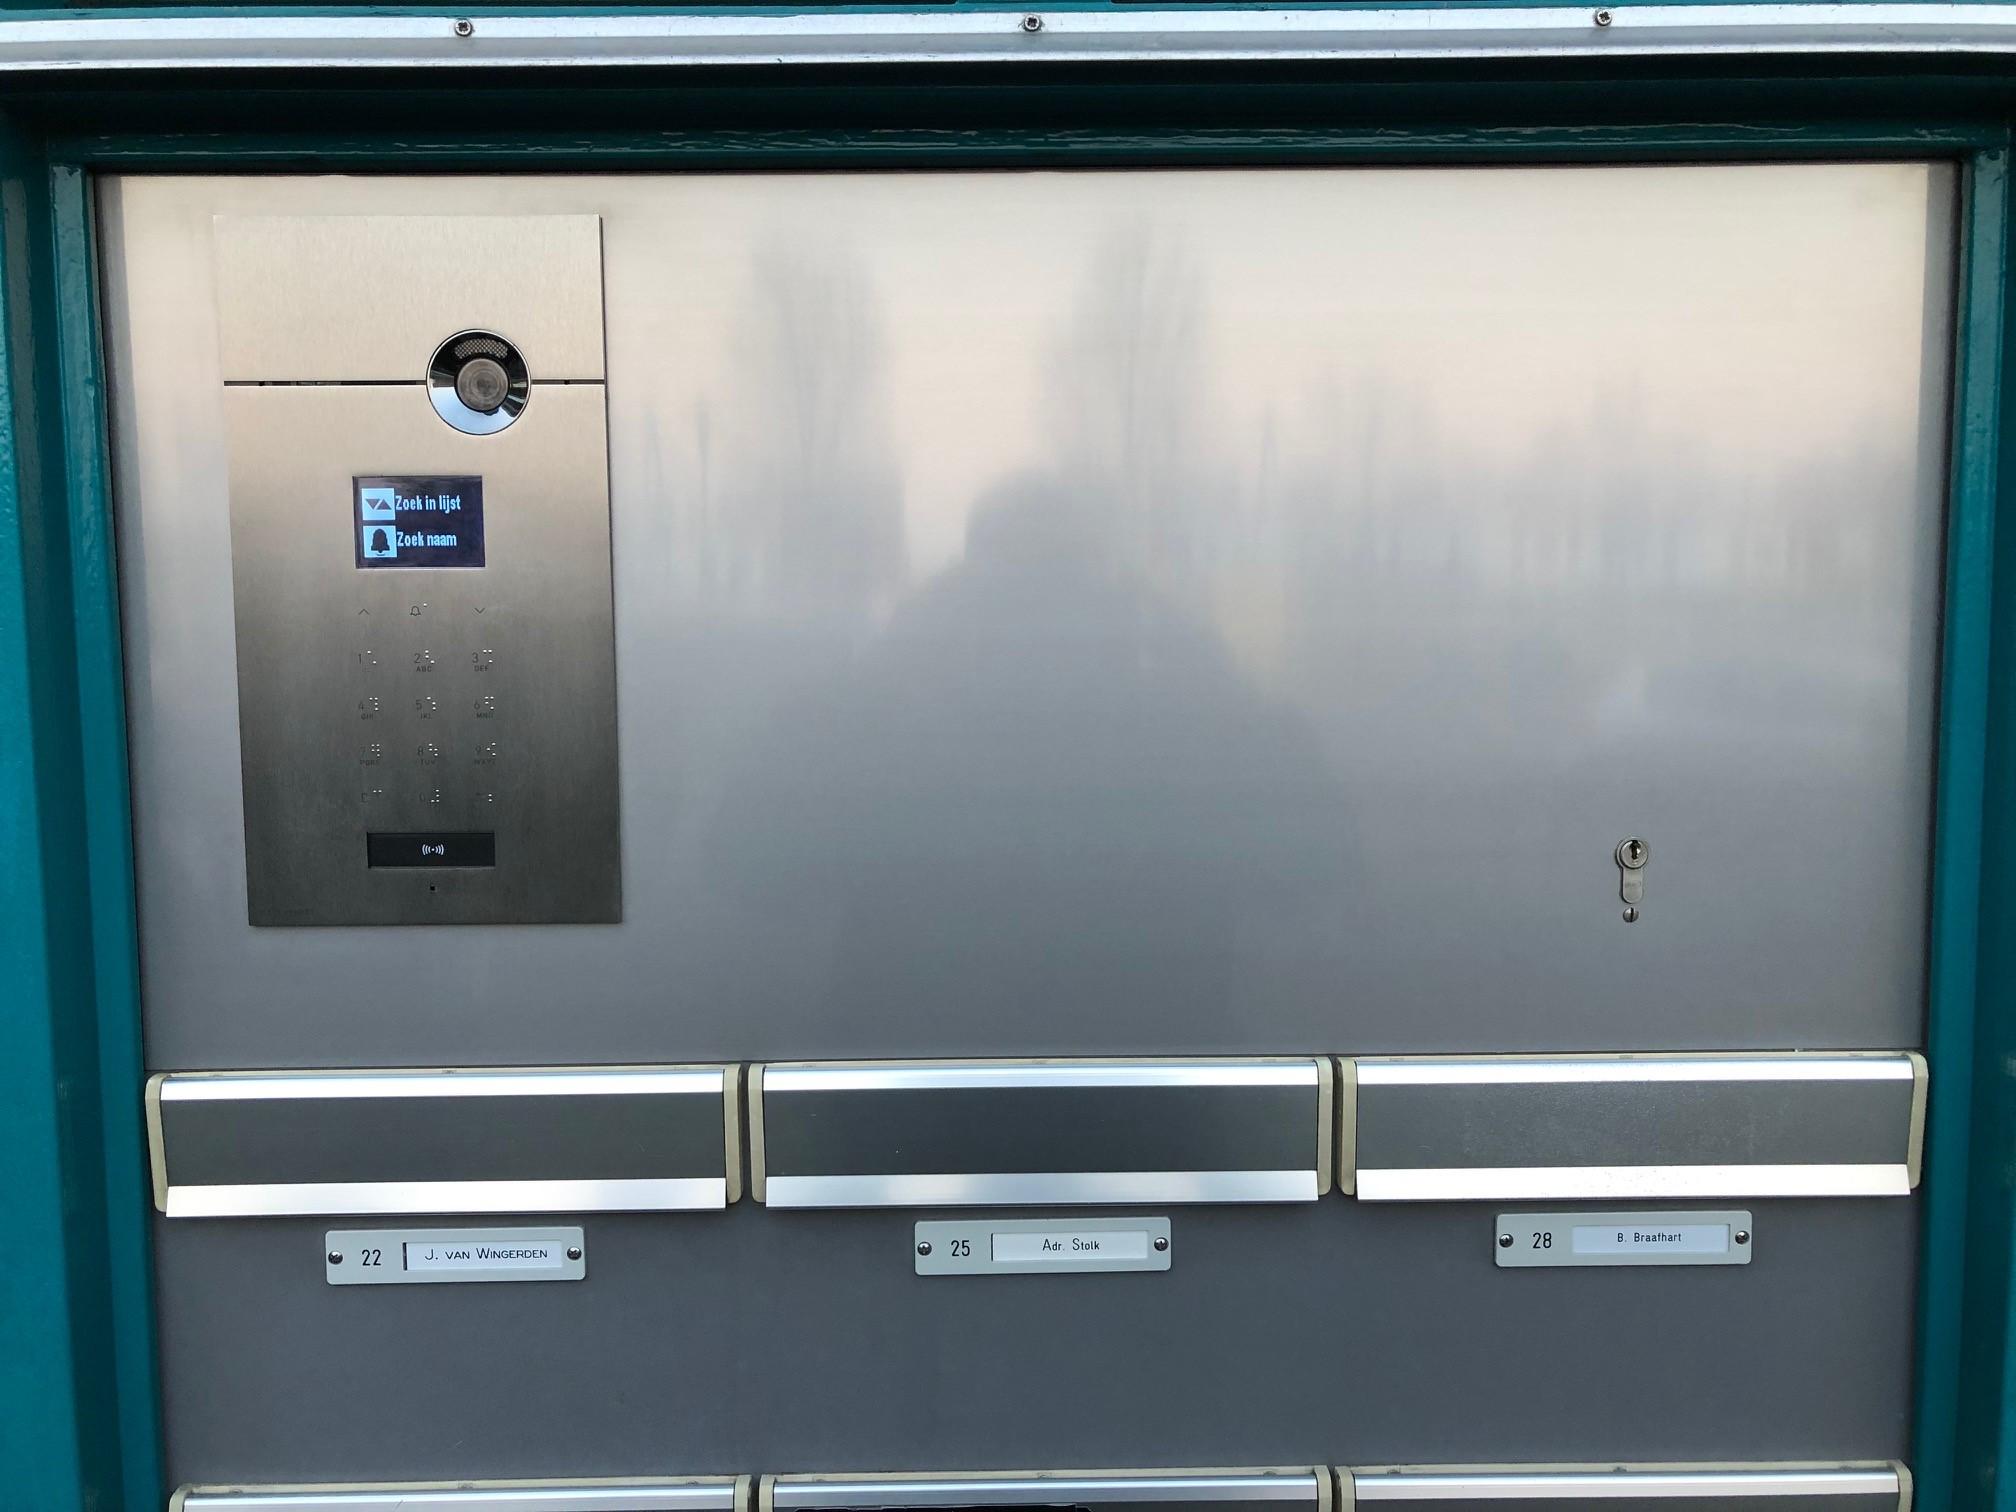 Nieuw Intercom Systeem In Henrik-Ido-Ambacht